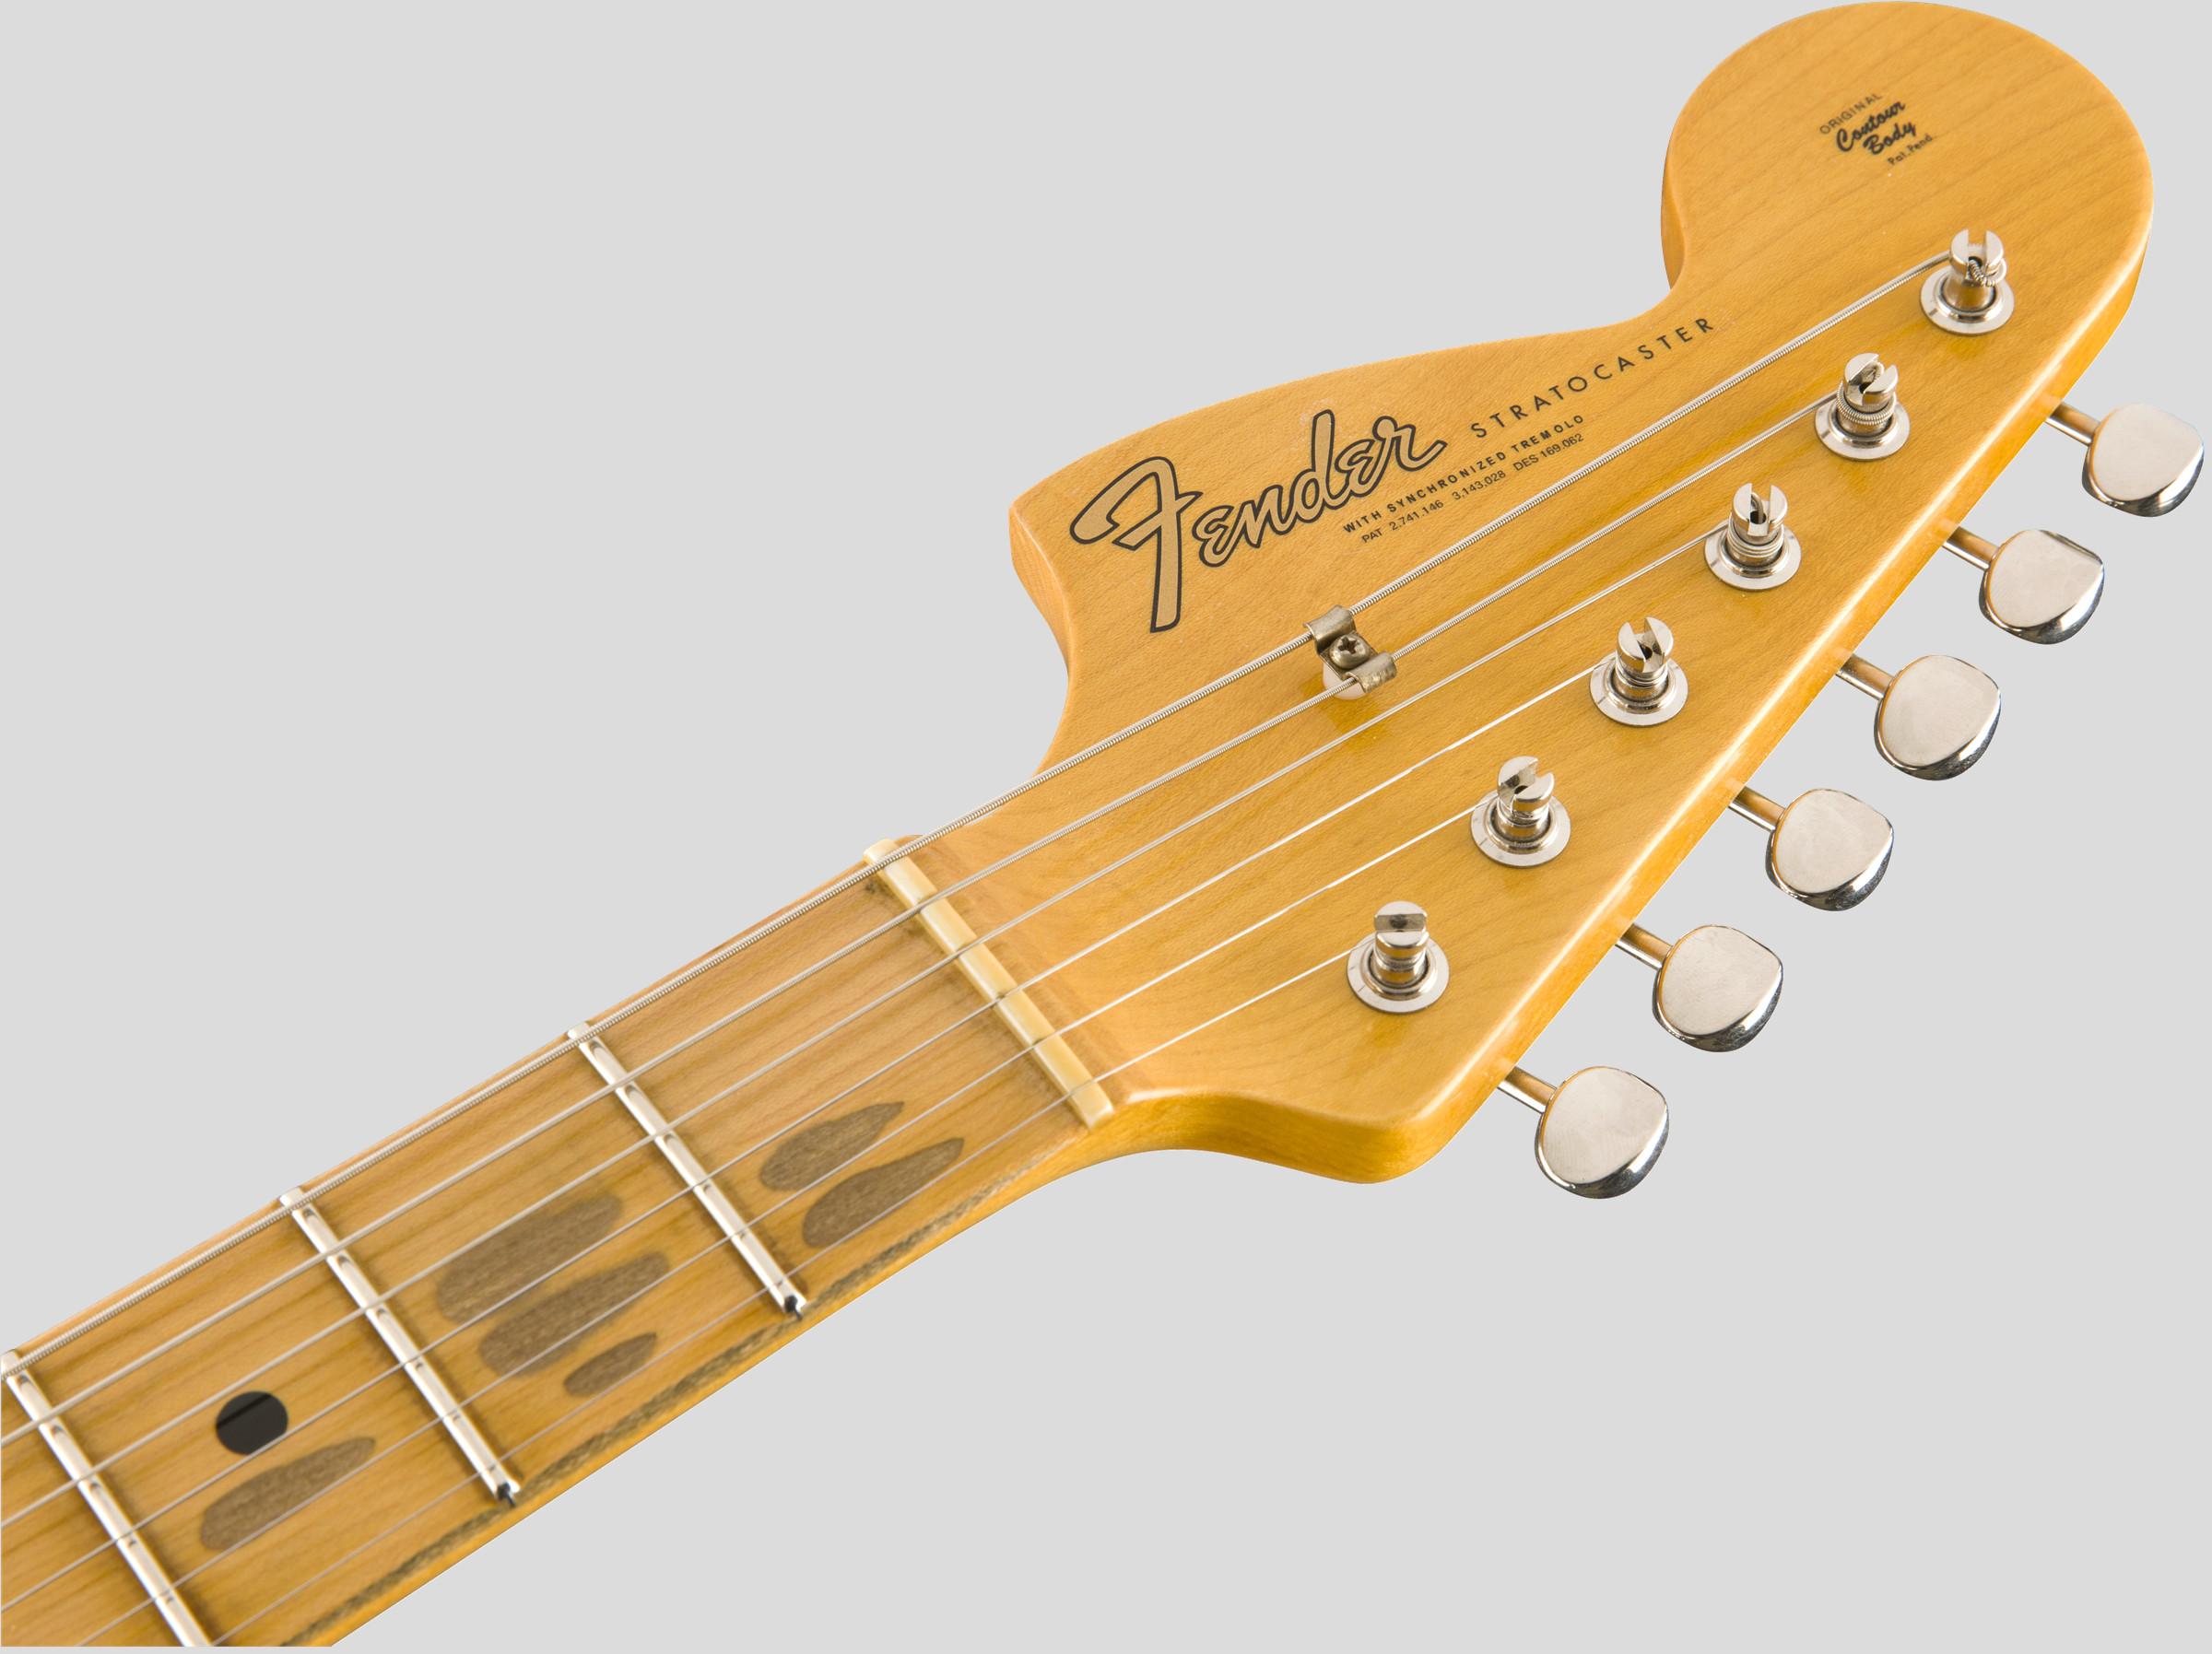 Fender Custom Shop Jimi Hendrix Voodoo Child Stratocaster Black Journeyman Relic 5